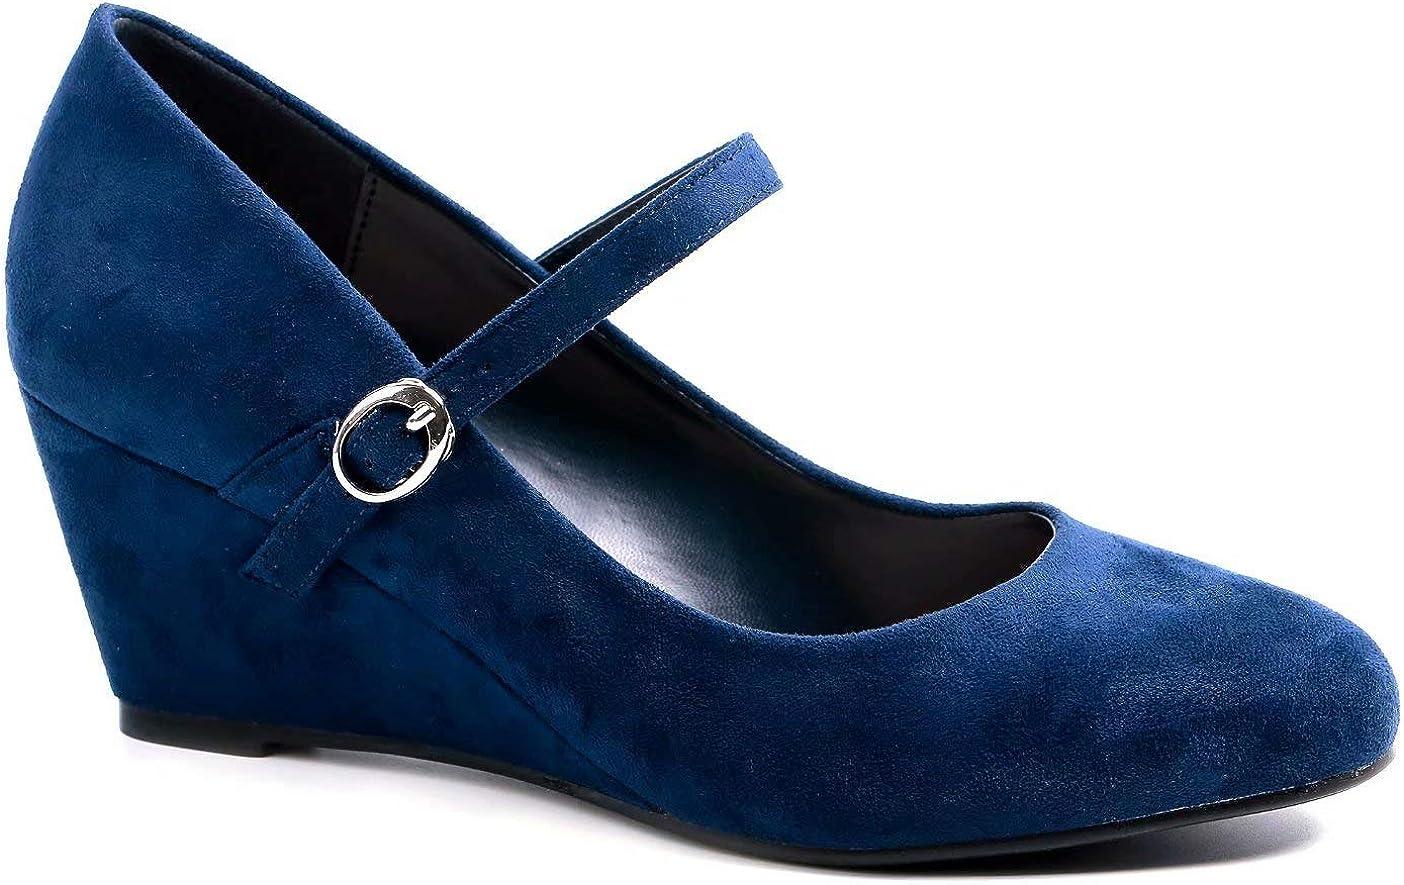 Greatonu Womens Office Wedge Platform Mid Heel Court Shoes